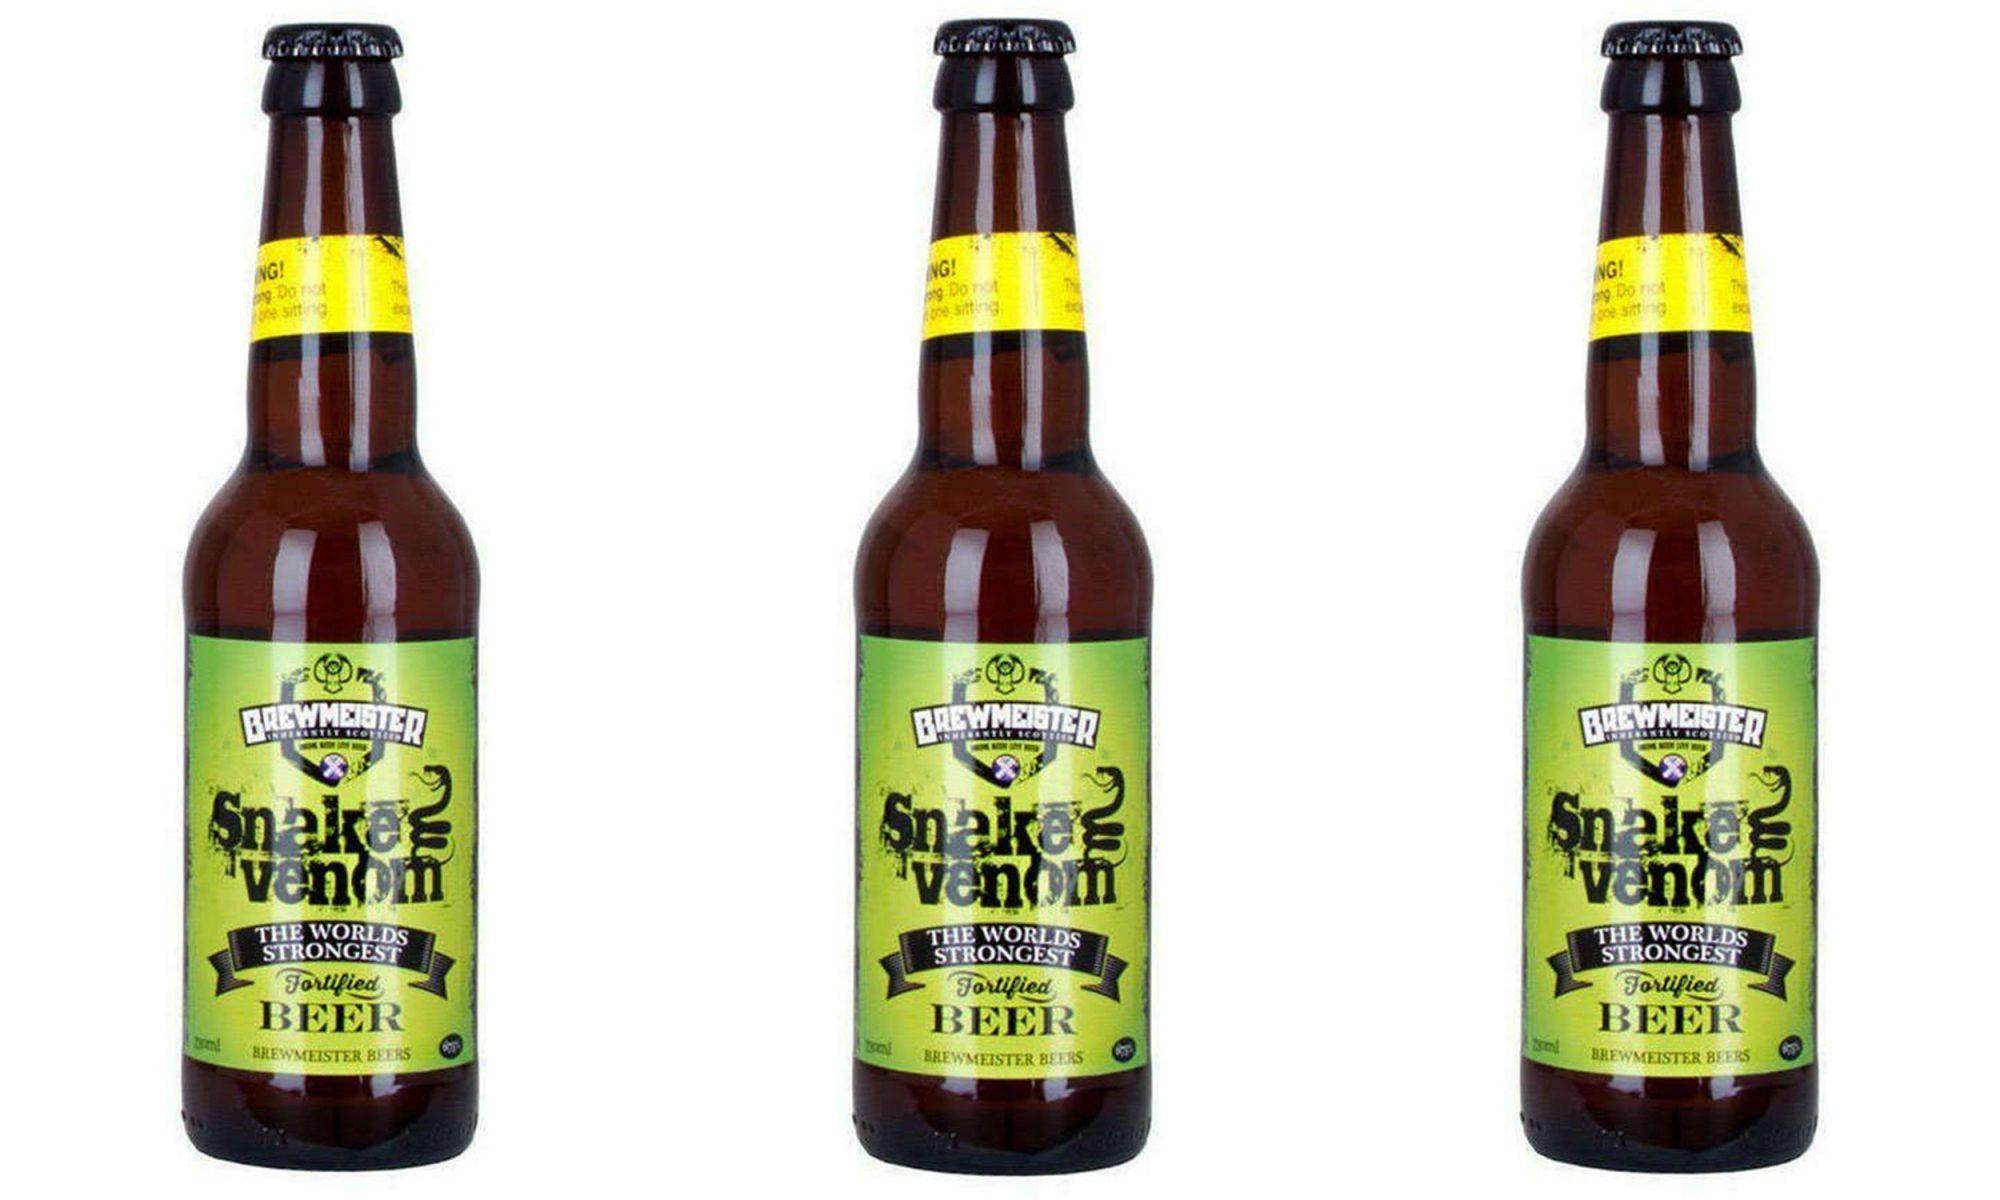 snake venom beer